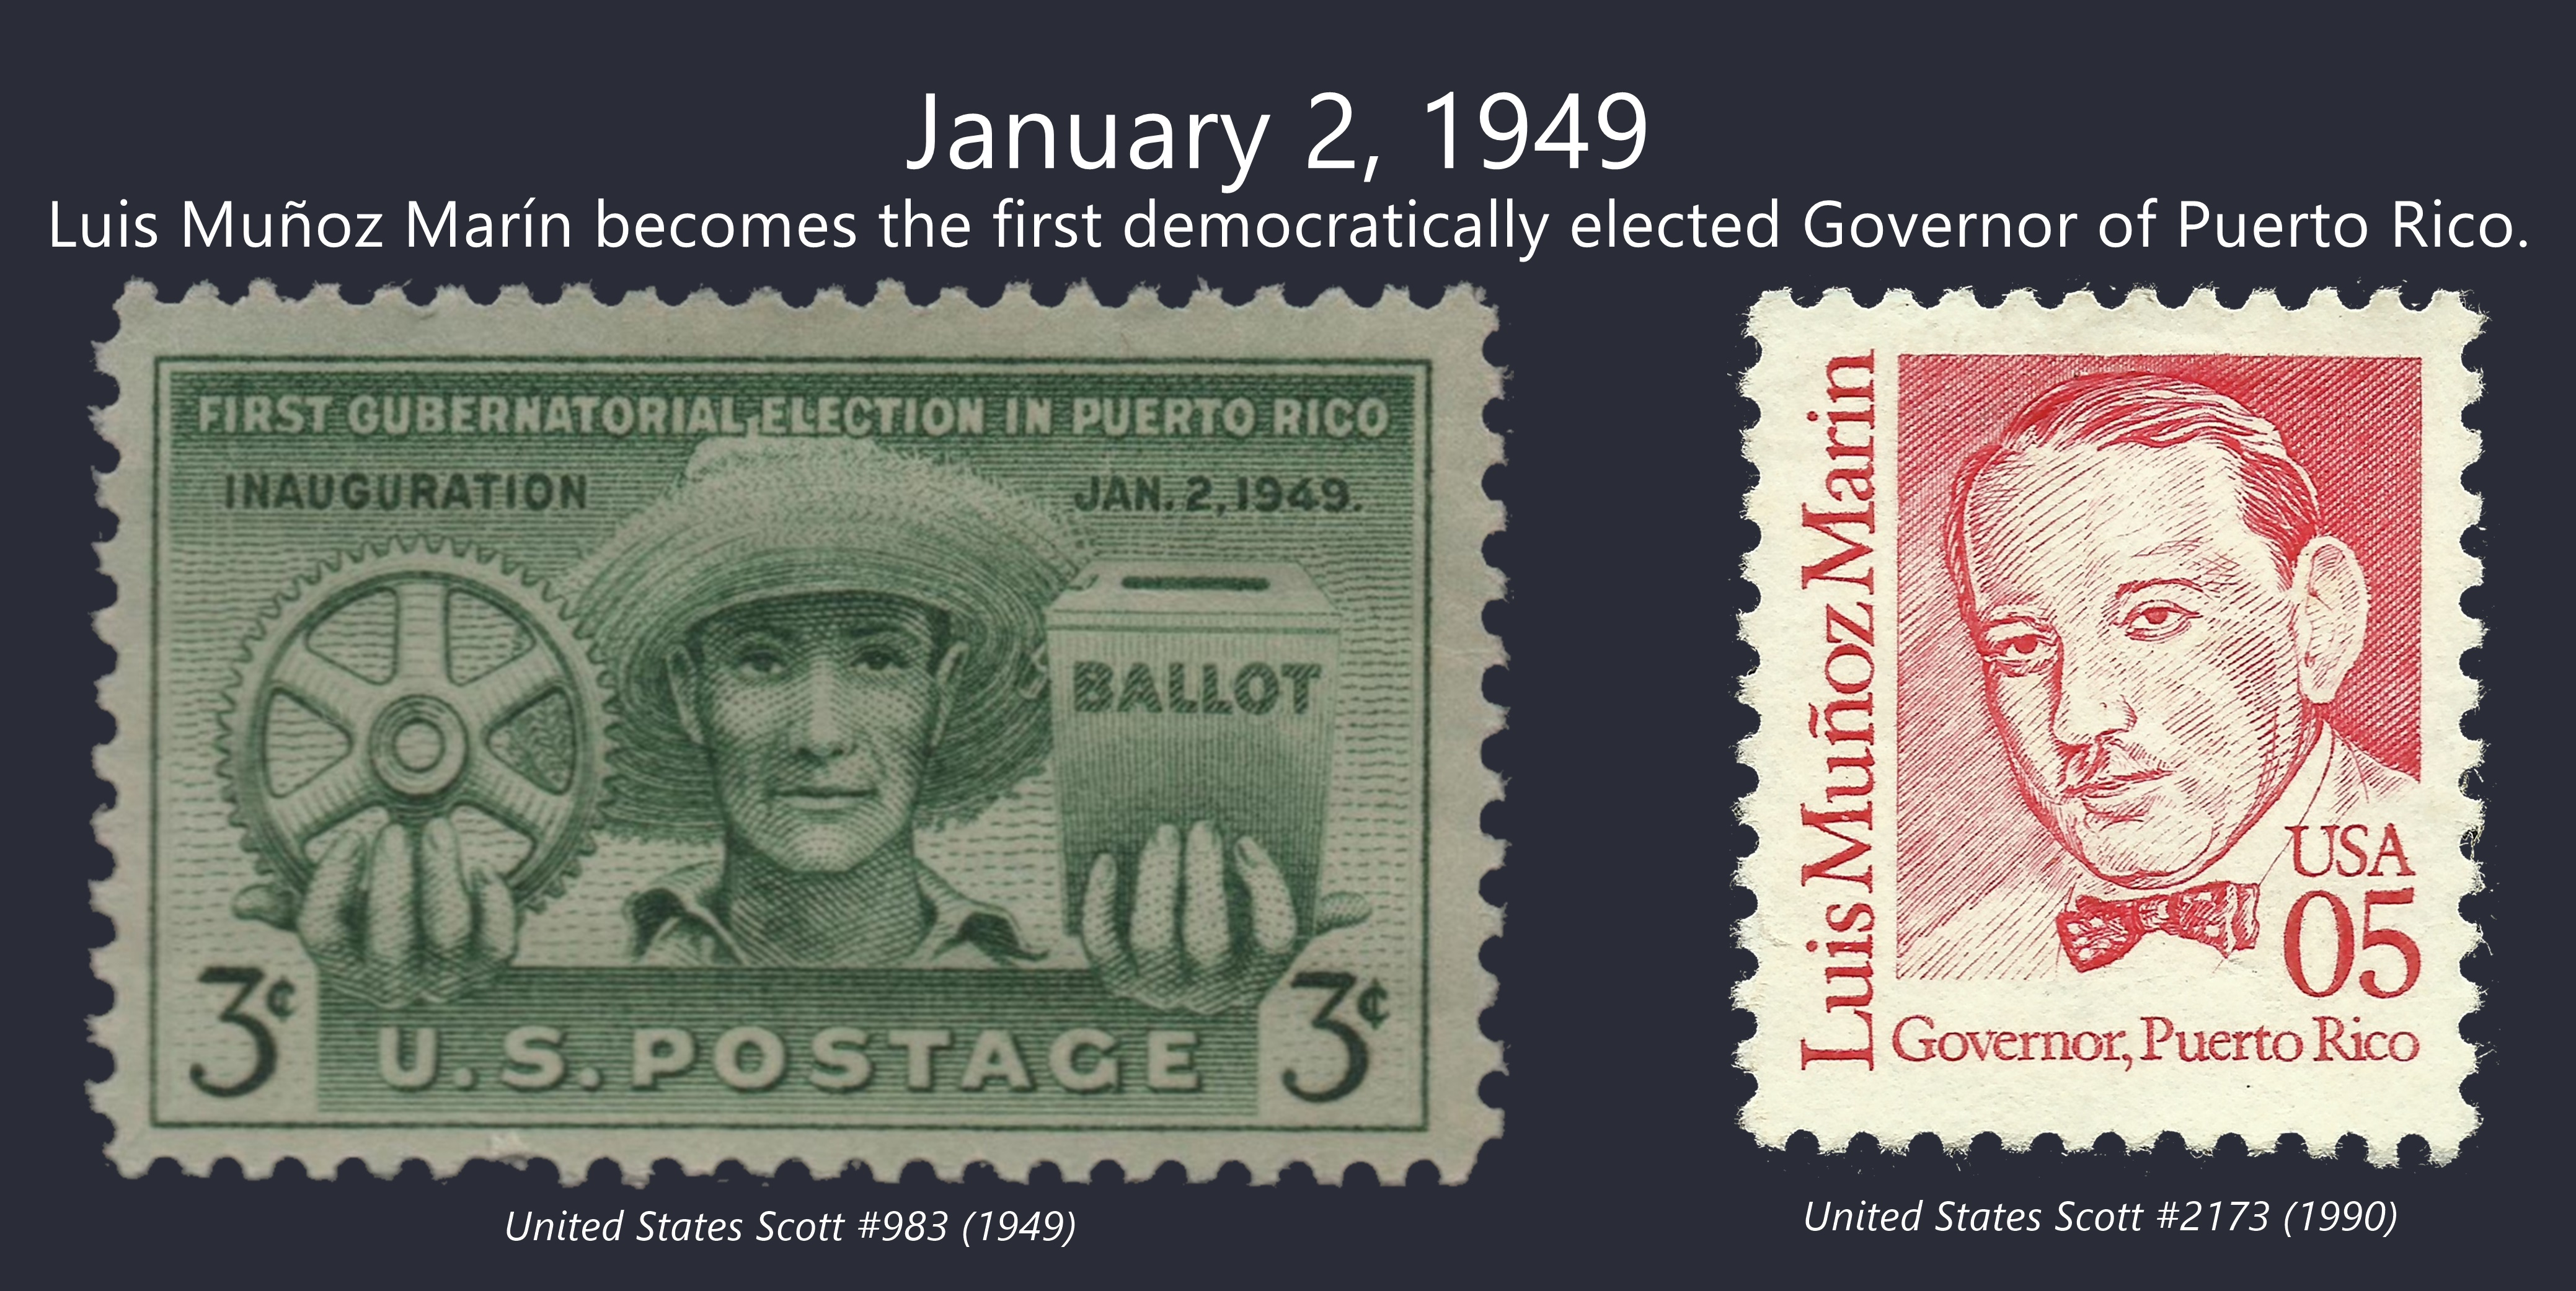 January 2, 1949